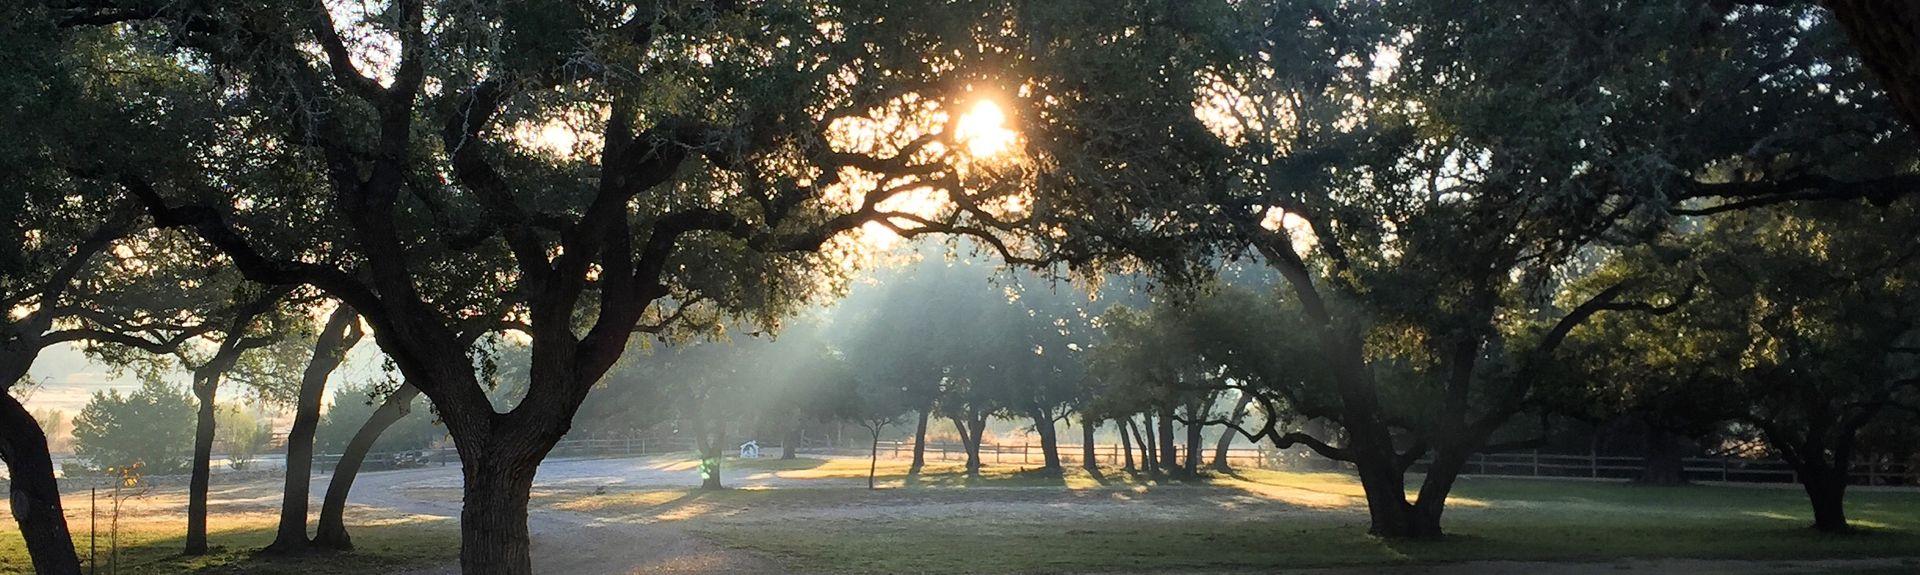 Dunbar Park, San Marcos, Texas, Verenigde Staten